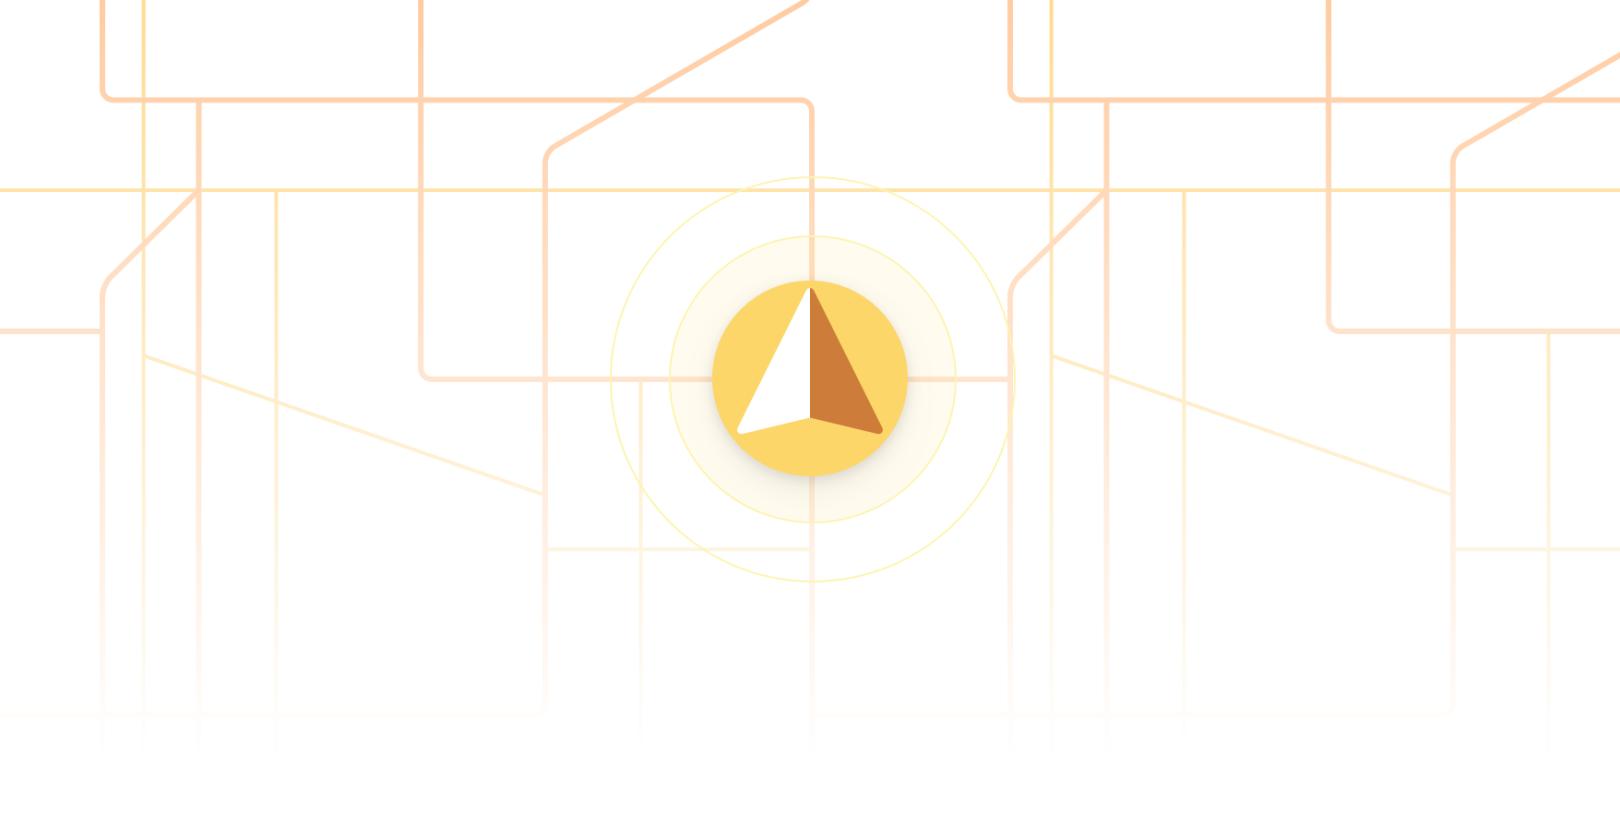 atlas-image